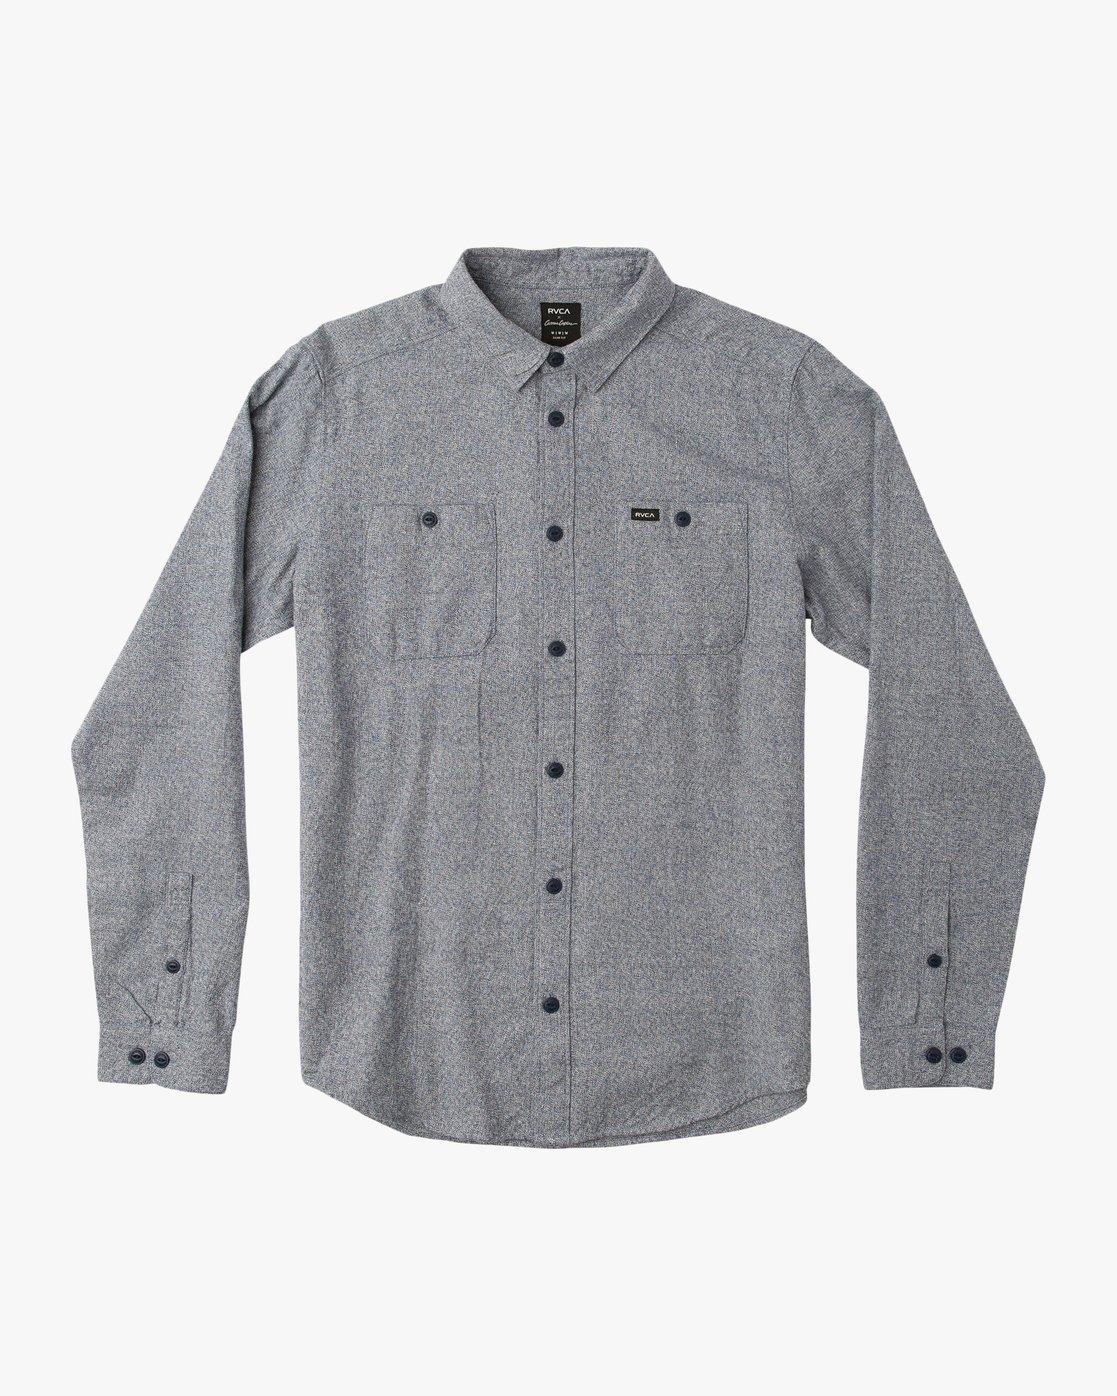 0 Twisted Long Sleeve Button-Up Shirt Blue M553QRTW RVCA